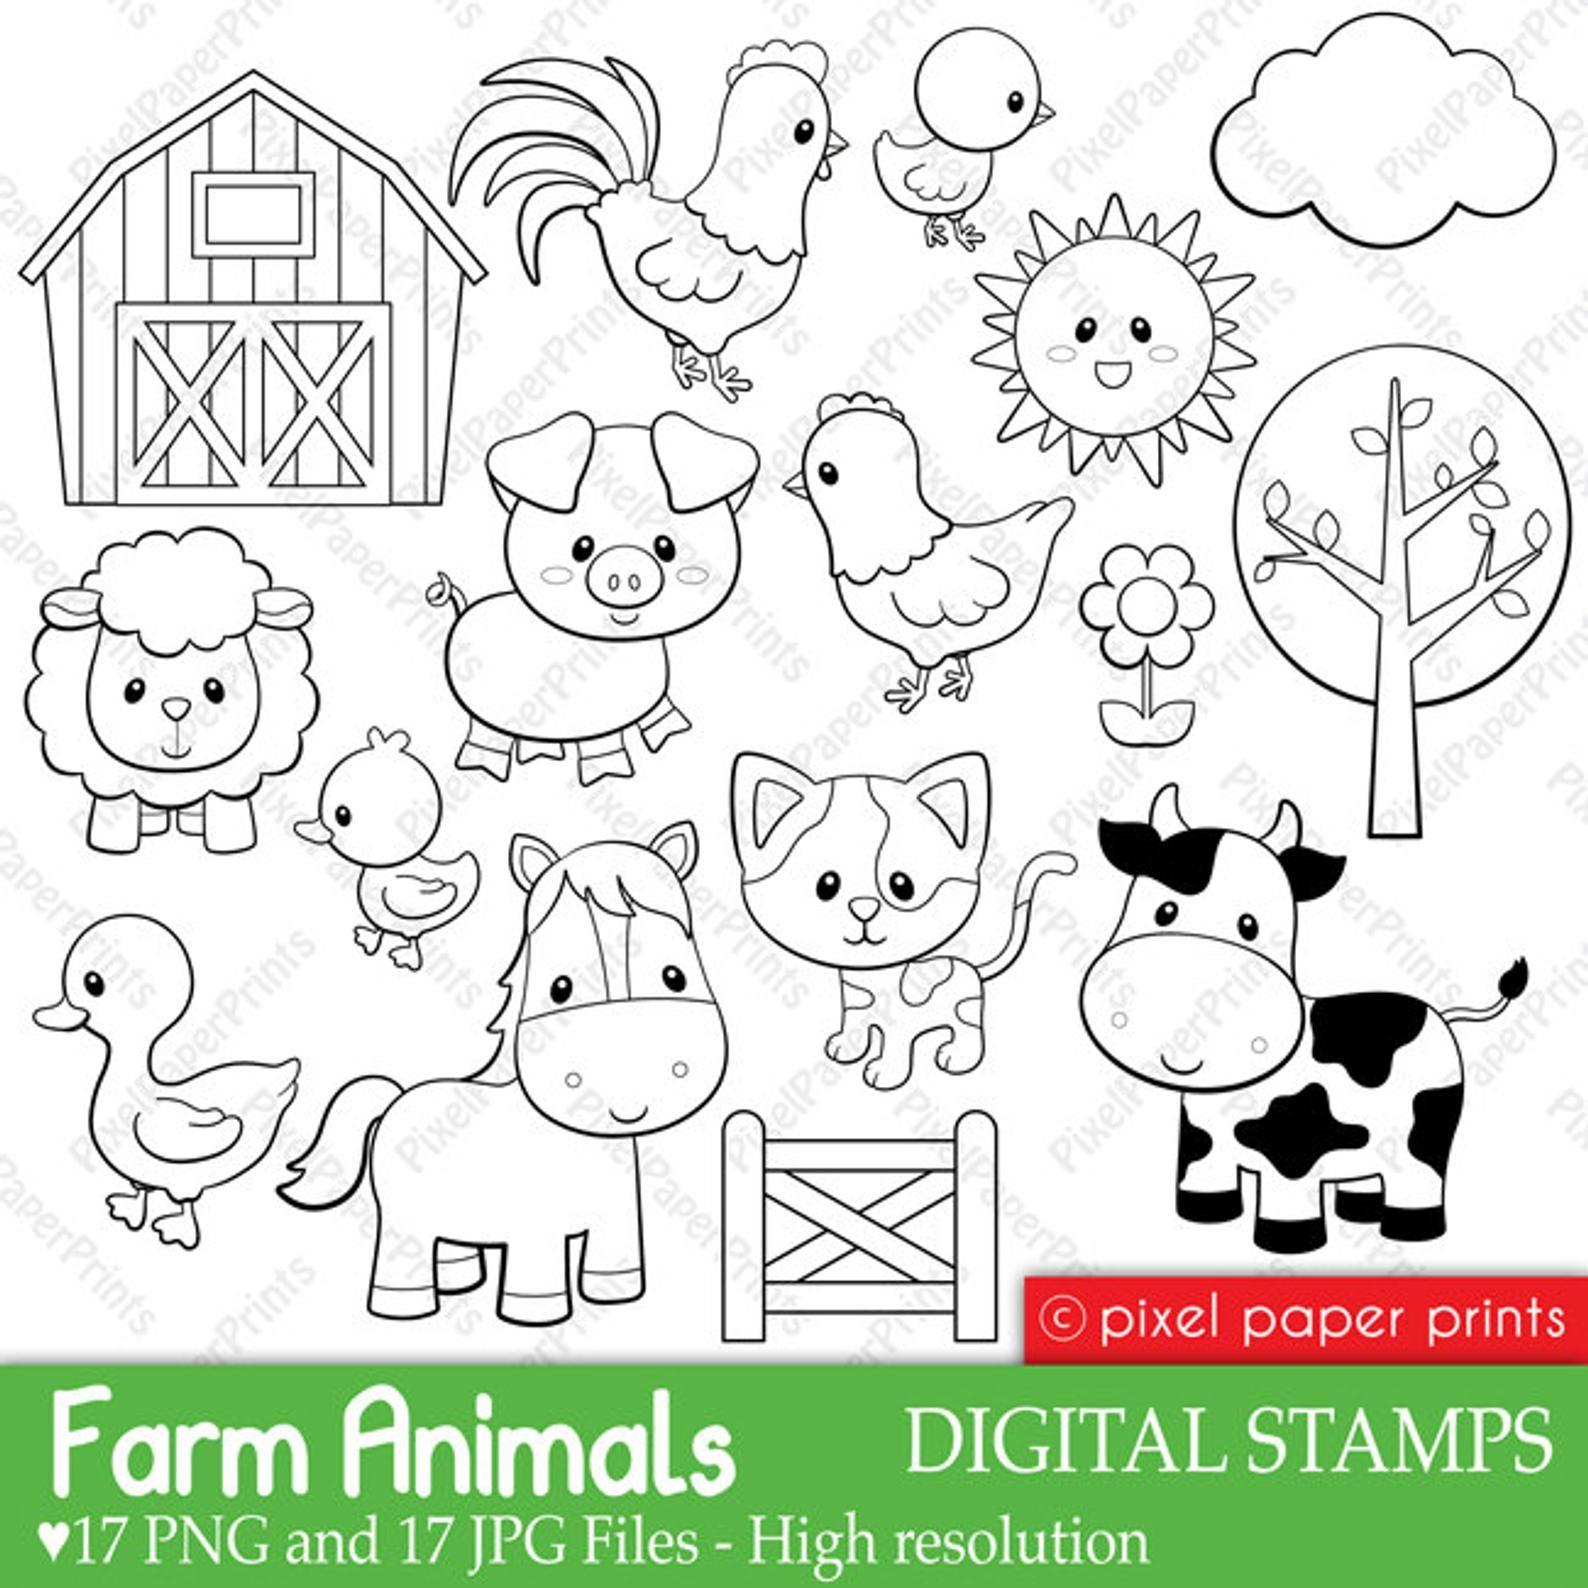 Farm Animals Digital Stamps Etsy Digital Stamps Animal Coloring Pages Farm Animal Coloring Pages